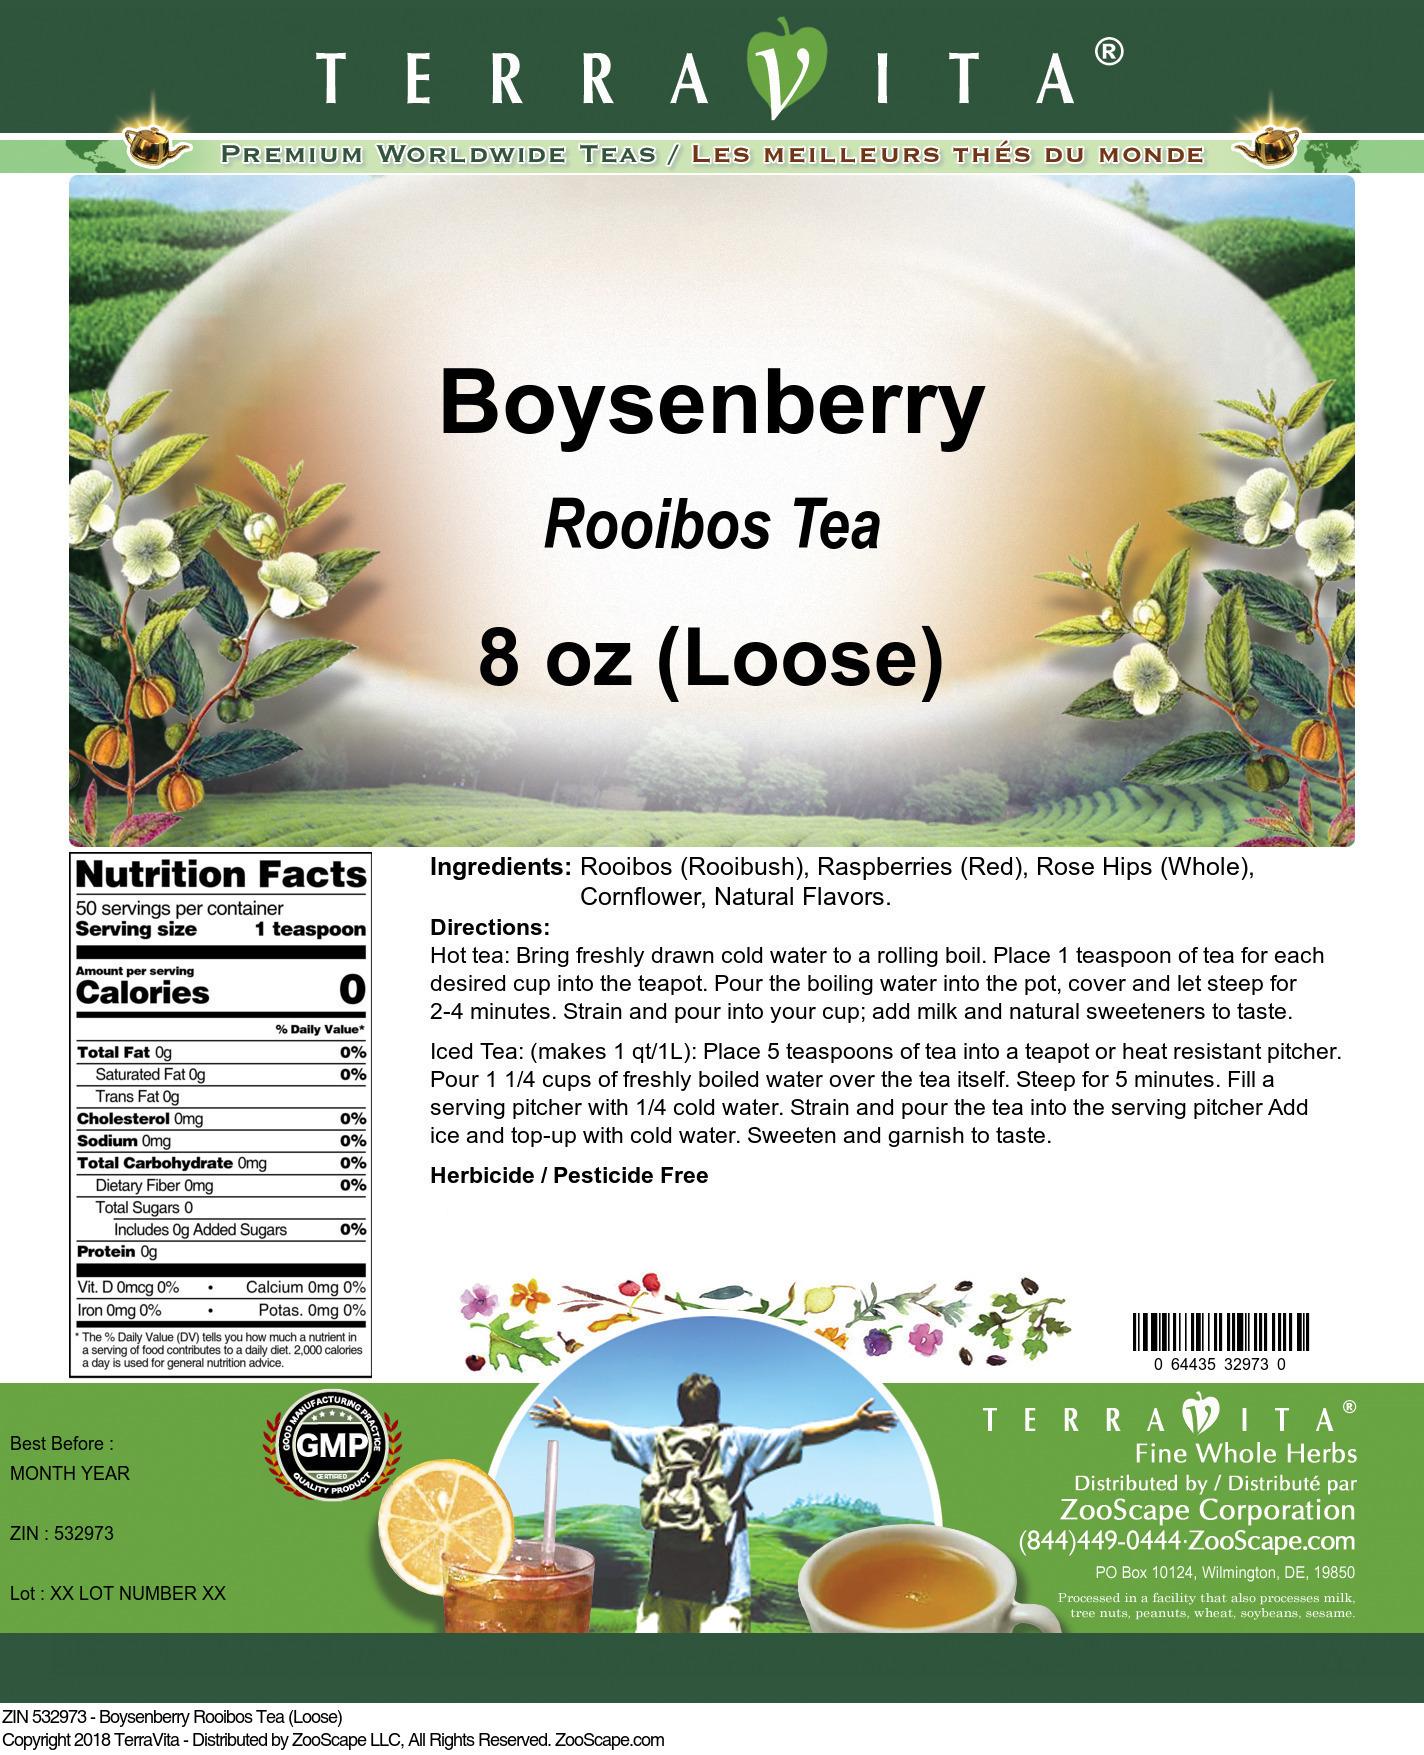 Boysenberry Rooibos Tea